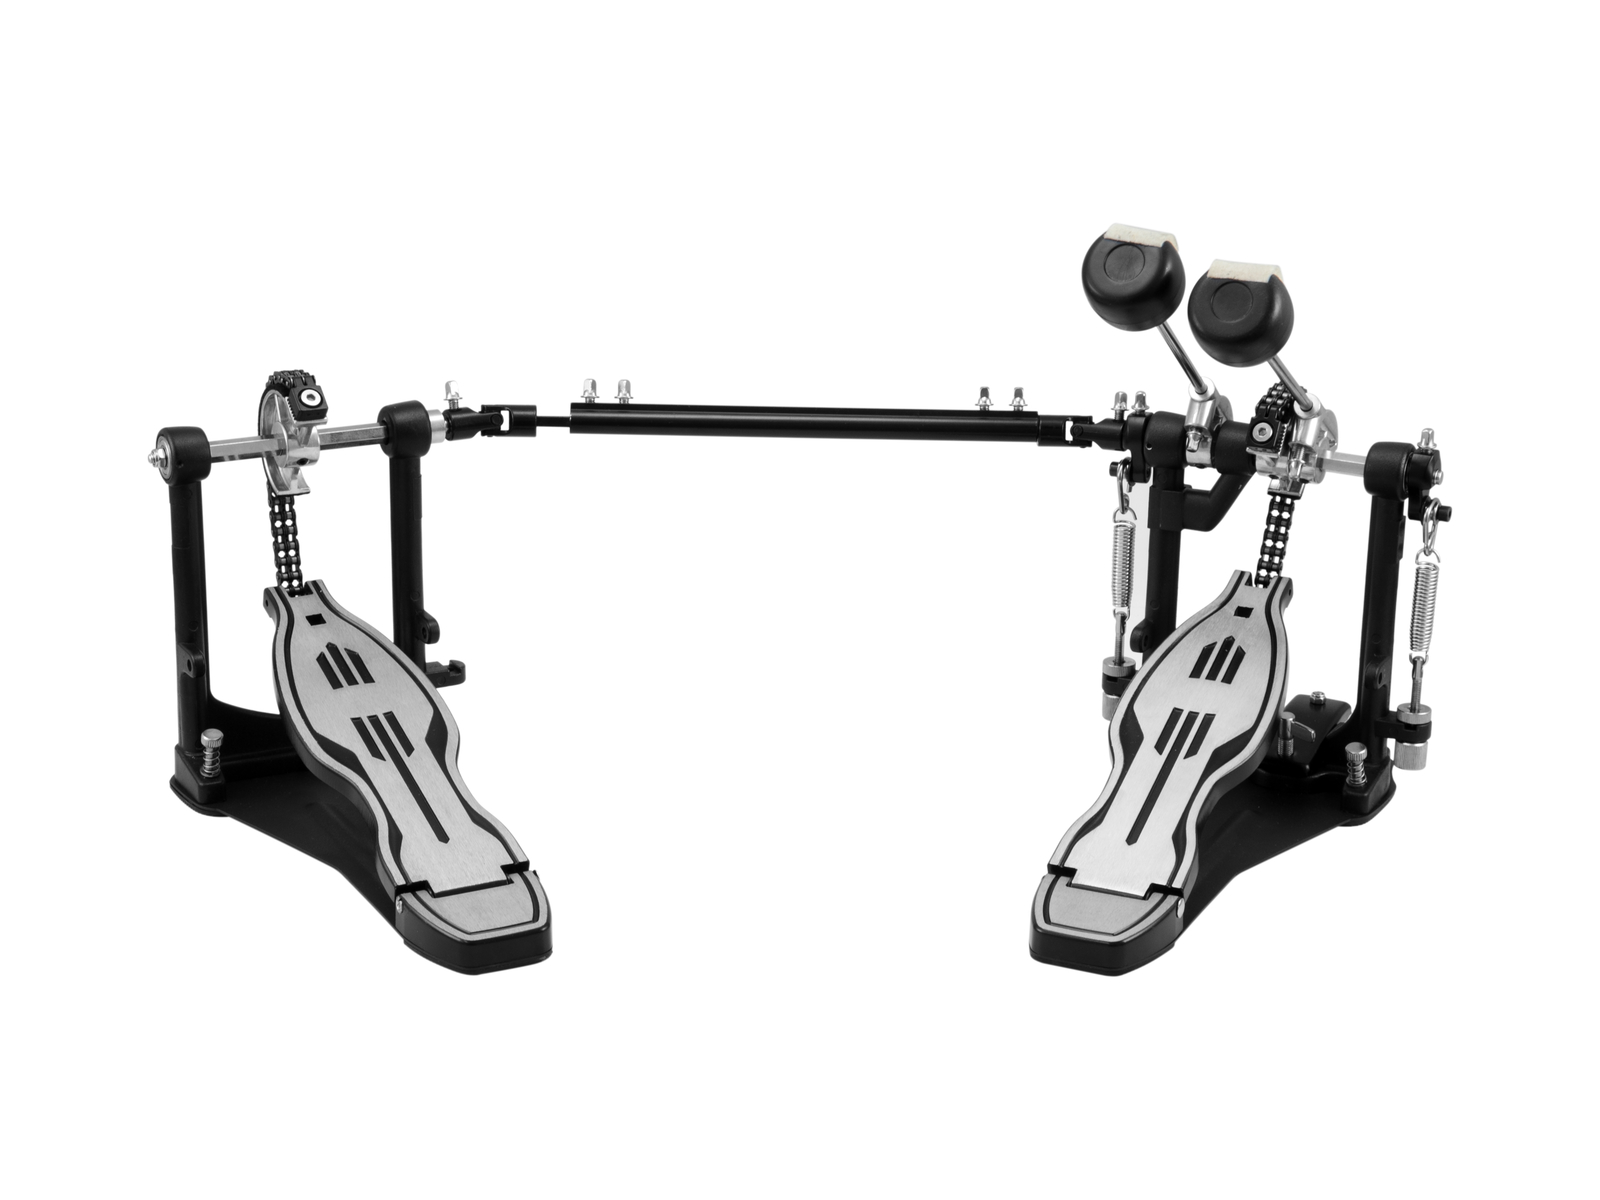 DIMAVERY DFM-1200 Doppel-Fußmaschine